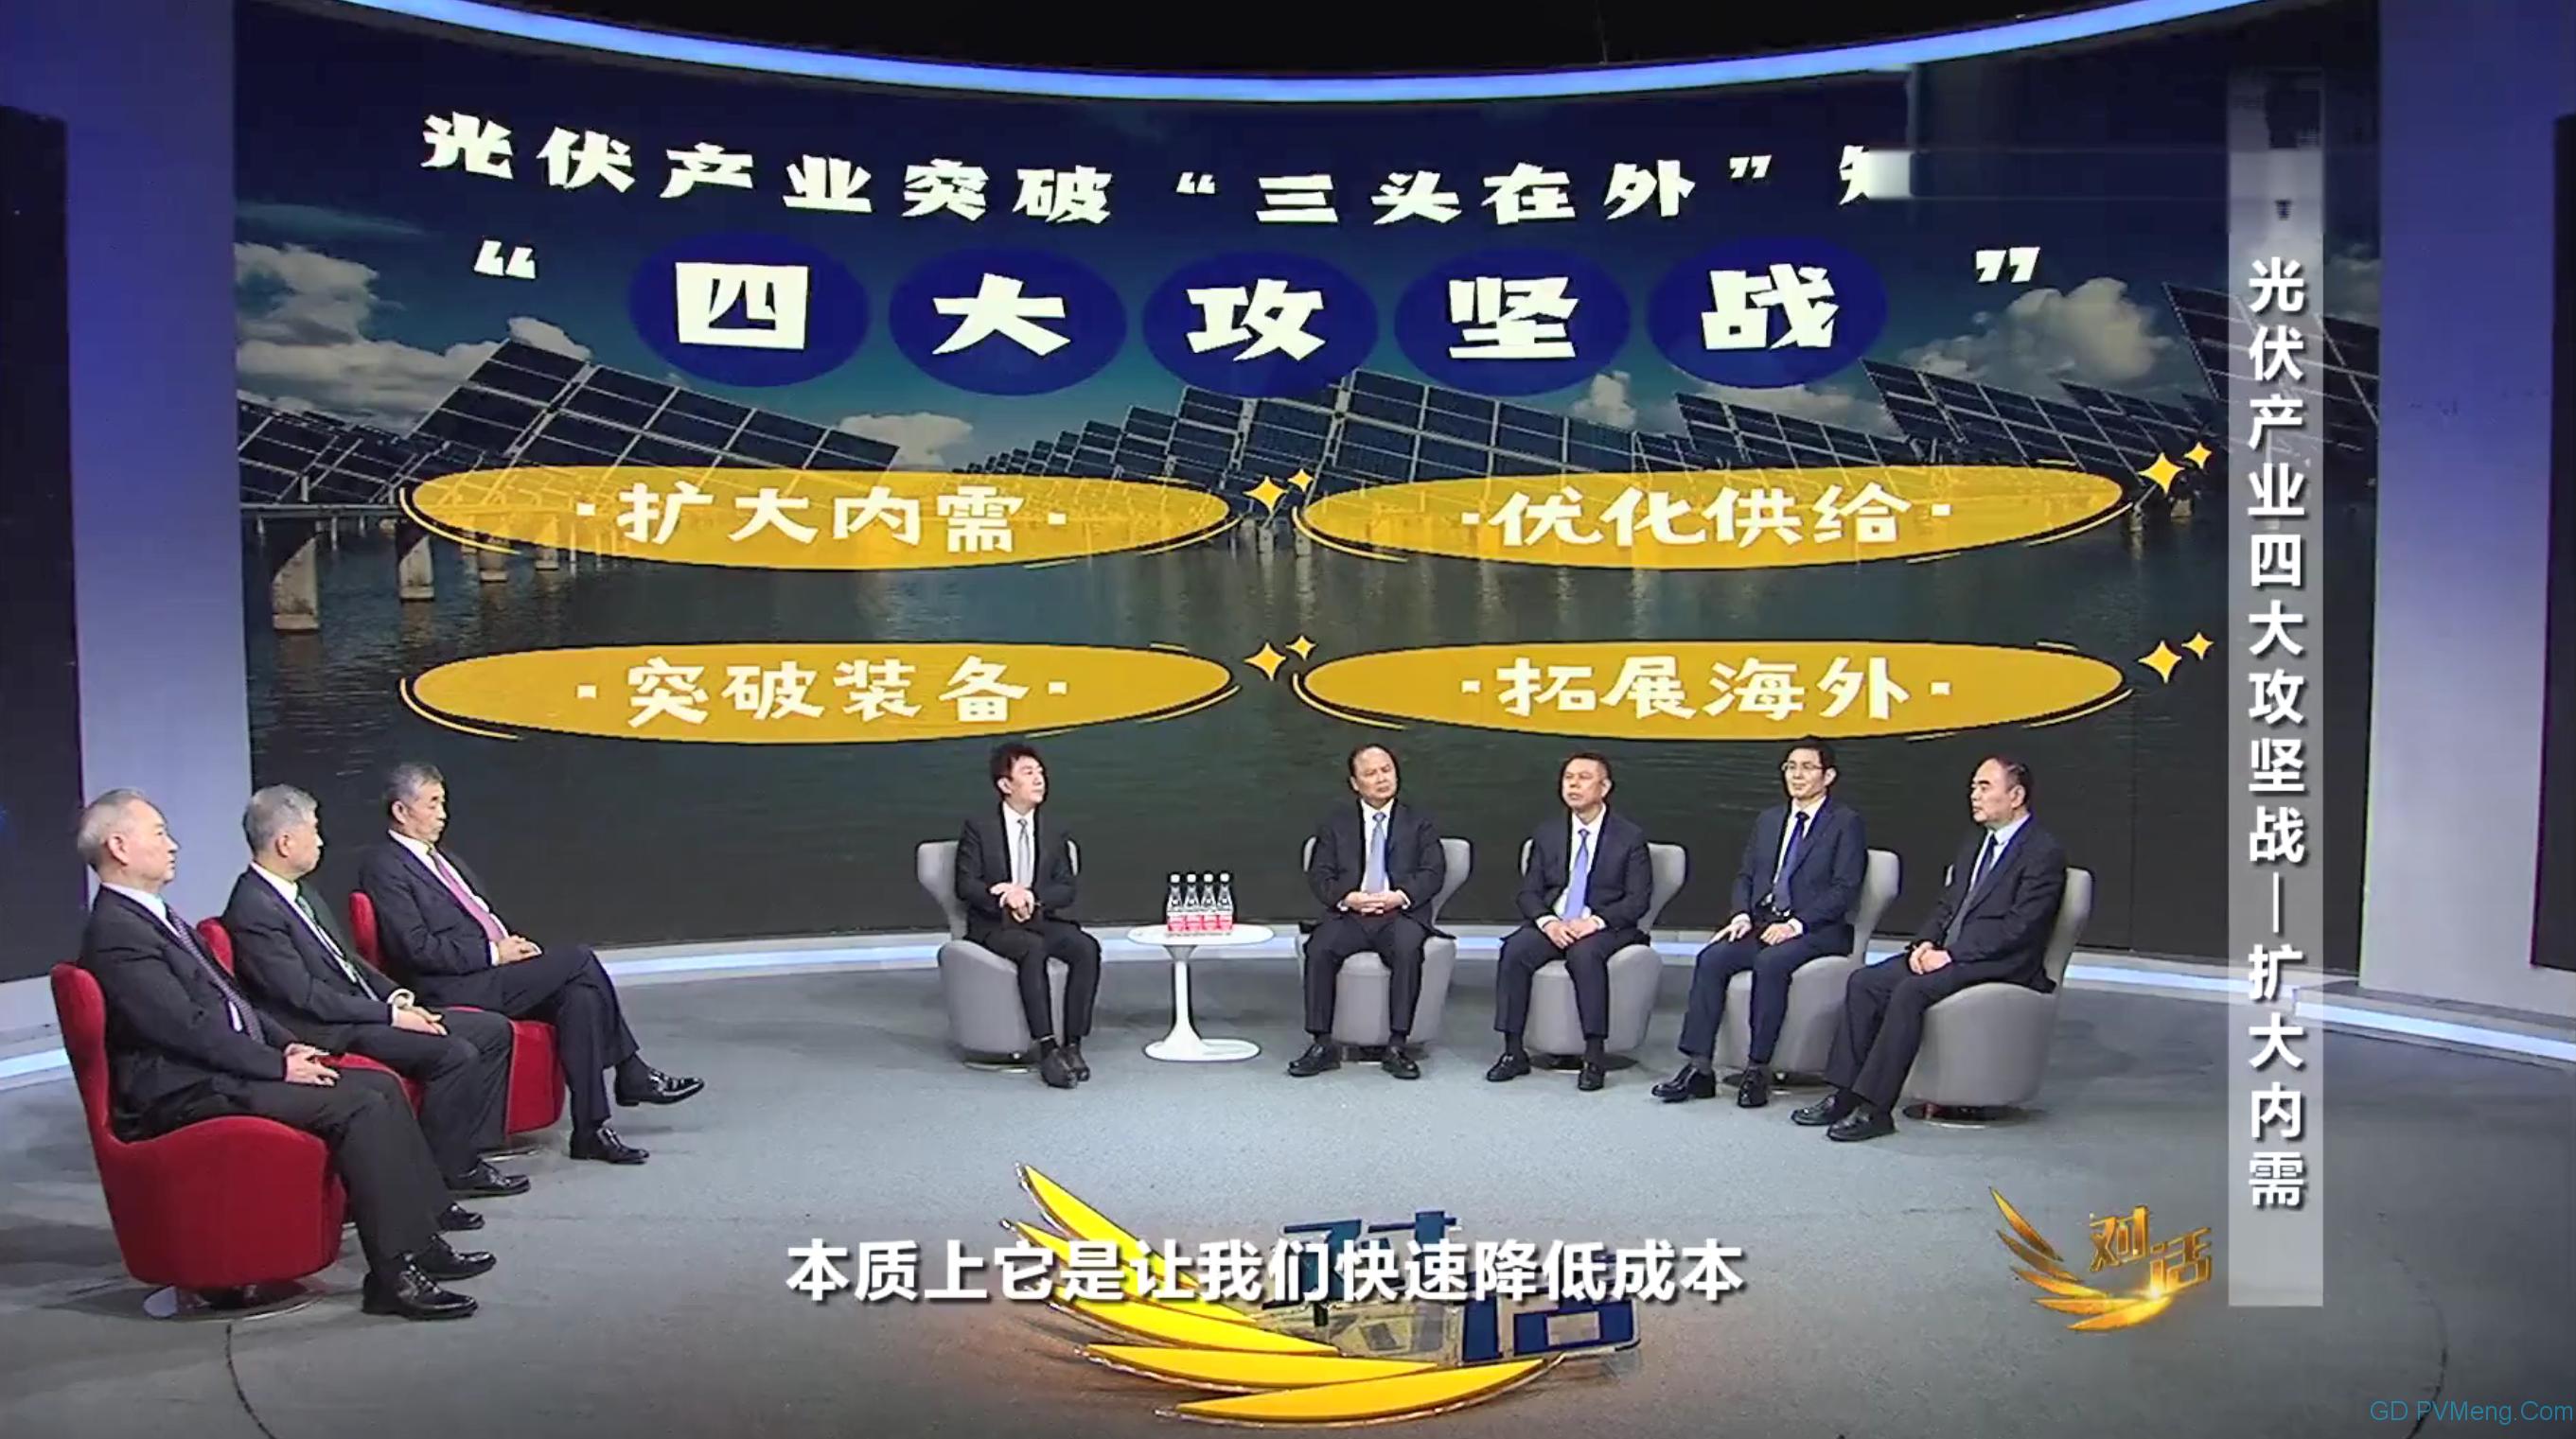 "【CCTV2对话】中国光伏,四大攻坚战破局""三头在外"",拿下三项世界第一  20201121"